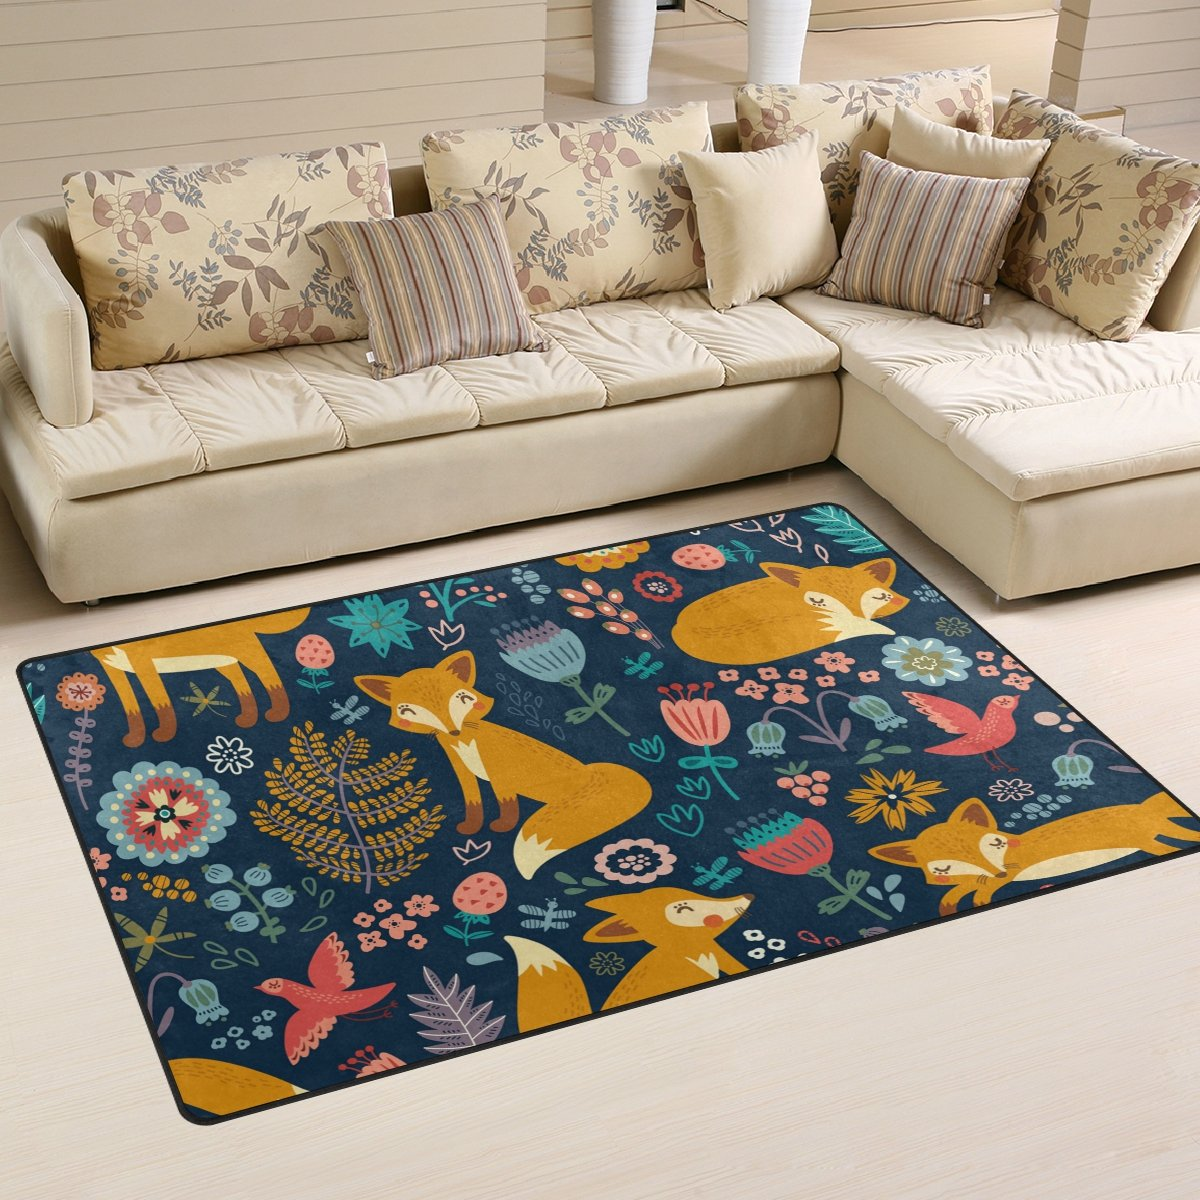 WellLee Area Rug,Cute Cartoon Forest Fox Floor Rug Non-slip Doormat for Living Dining Dorm Room Bedroom Decor 60x39 Inch